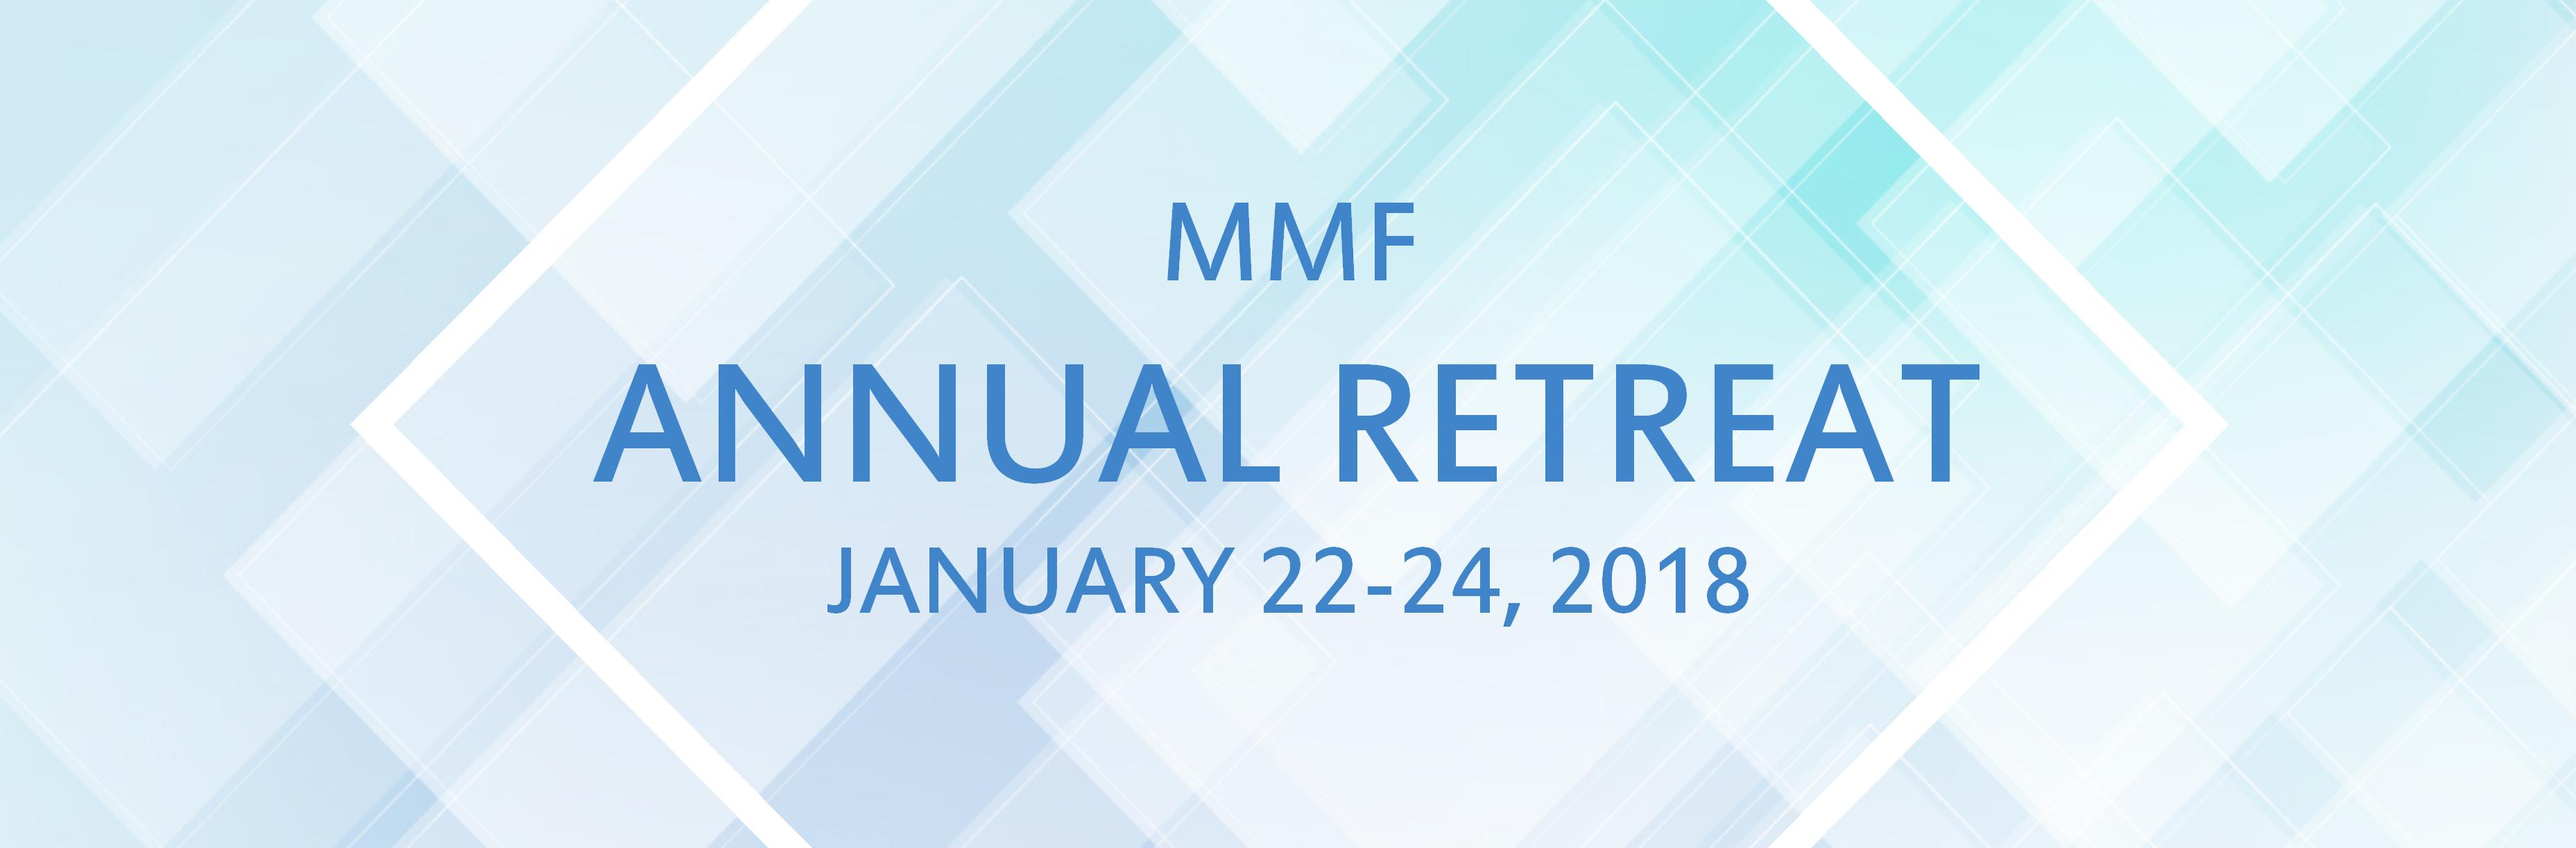 2018 Annual MMF Retreat